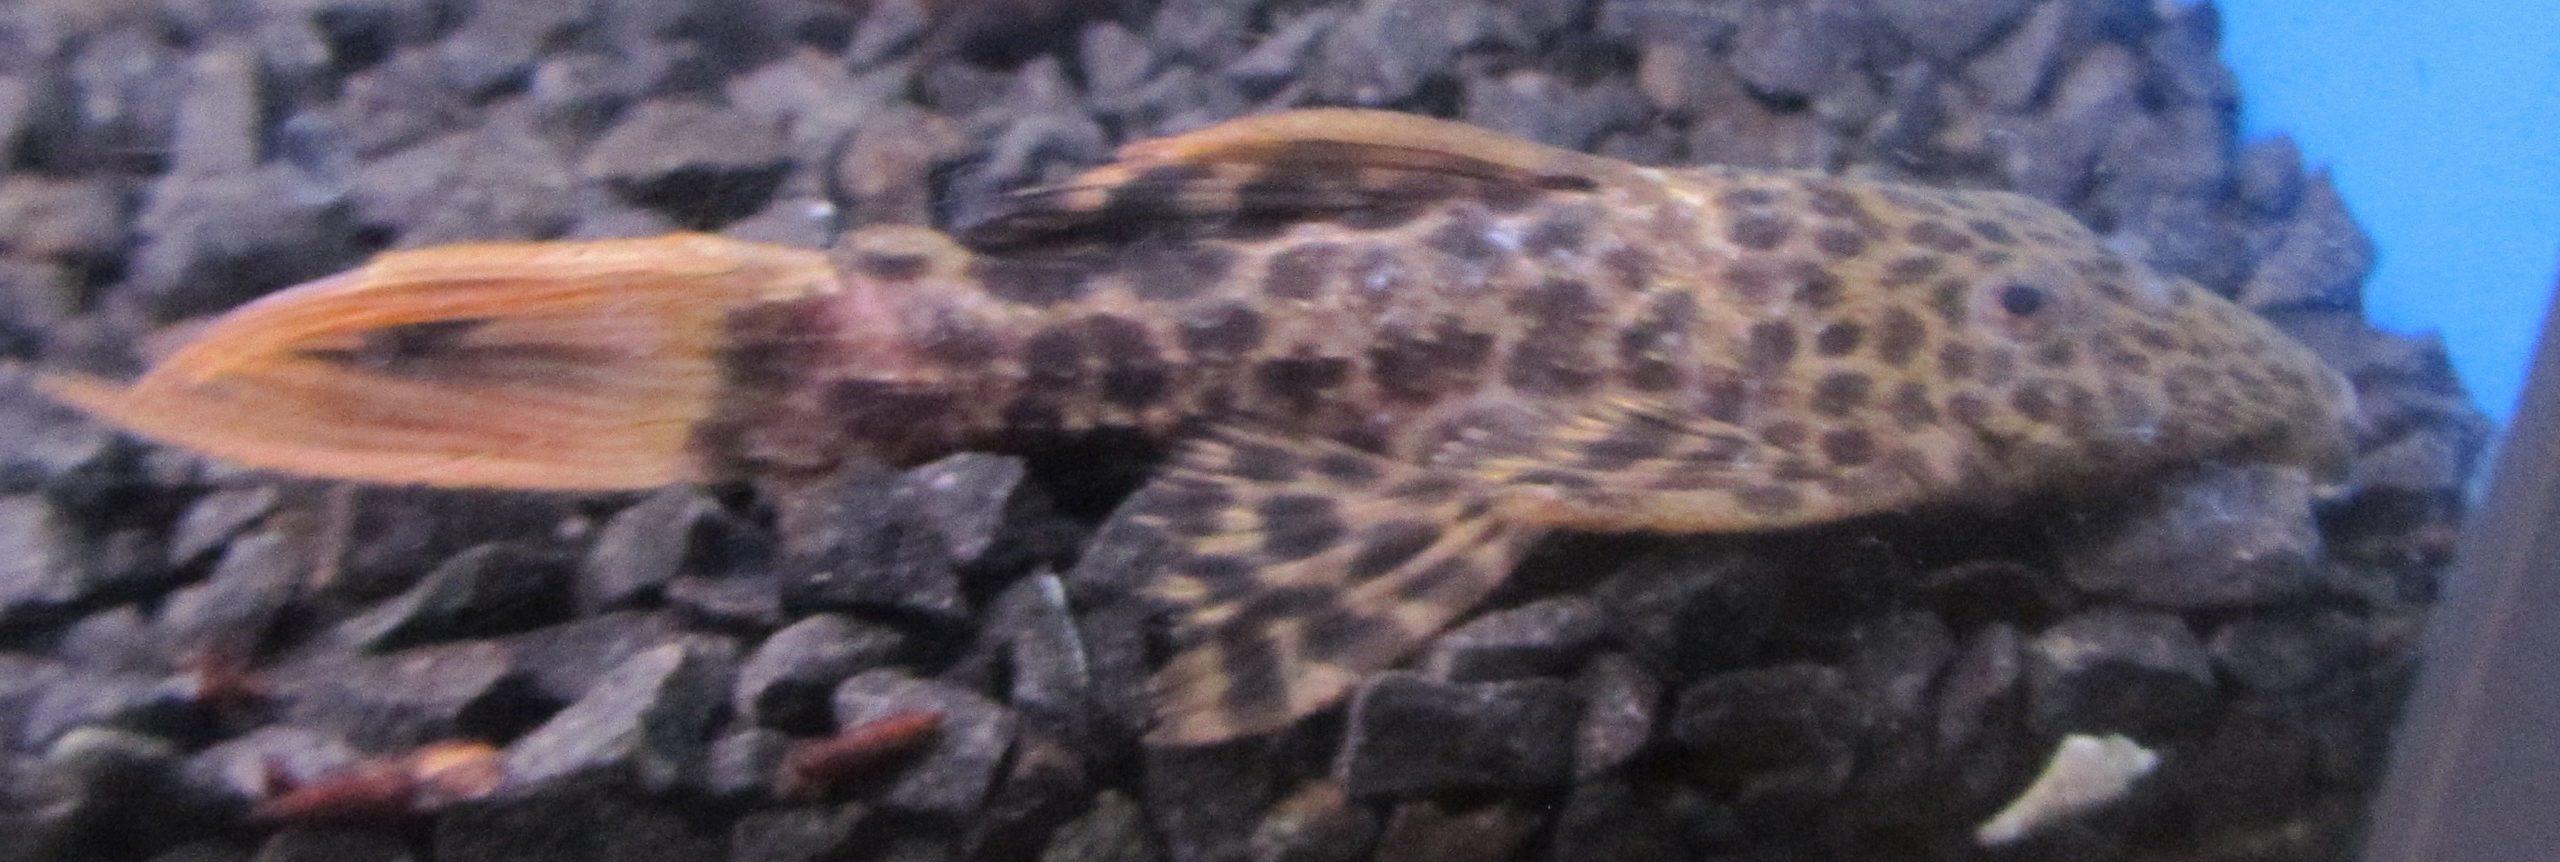 L - 114 Leopard kaktus Malle.